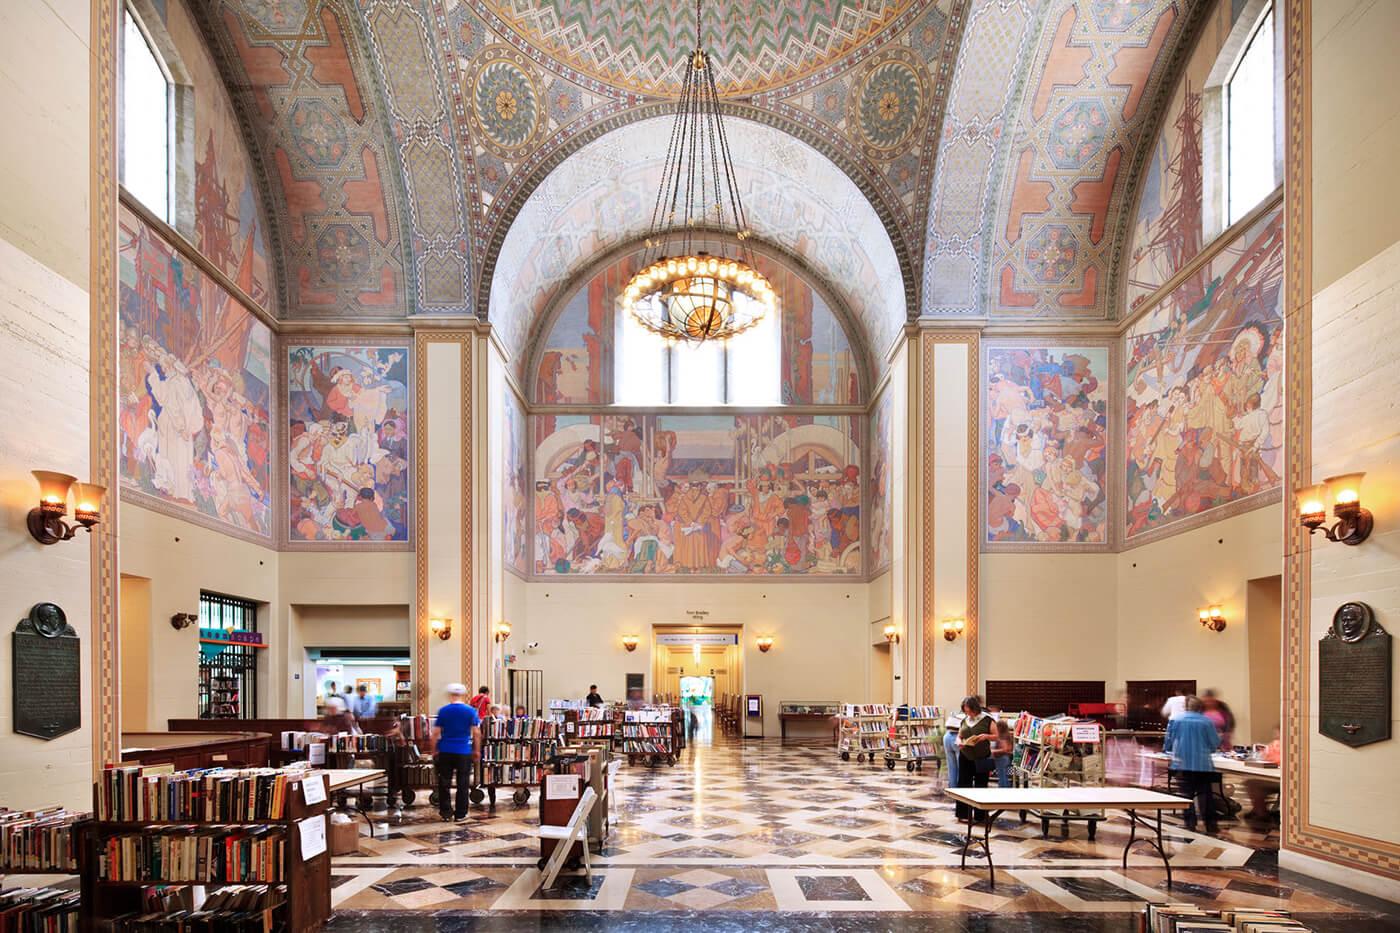 Los Angeles Central Library in Los Angeles, CA